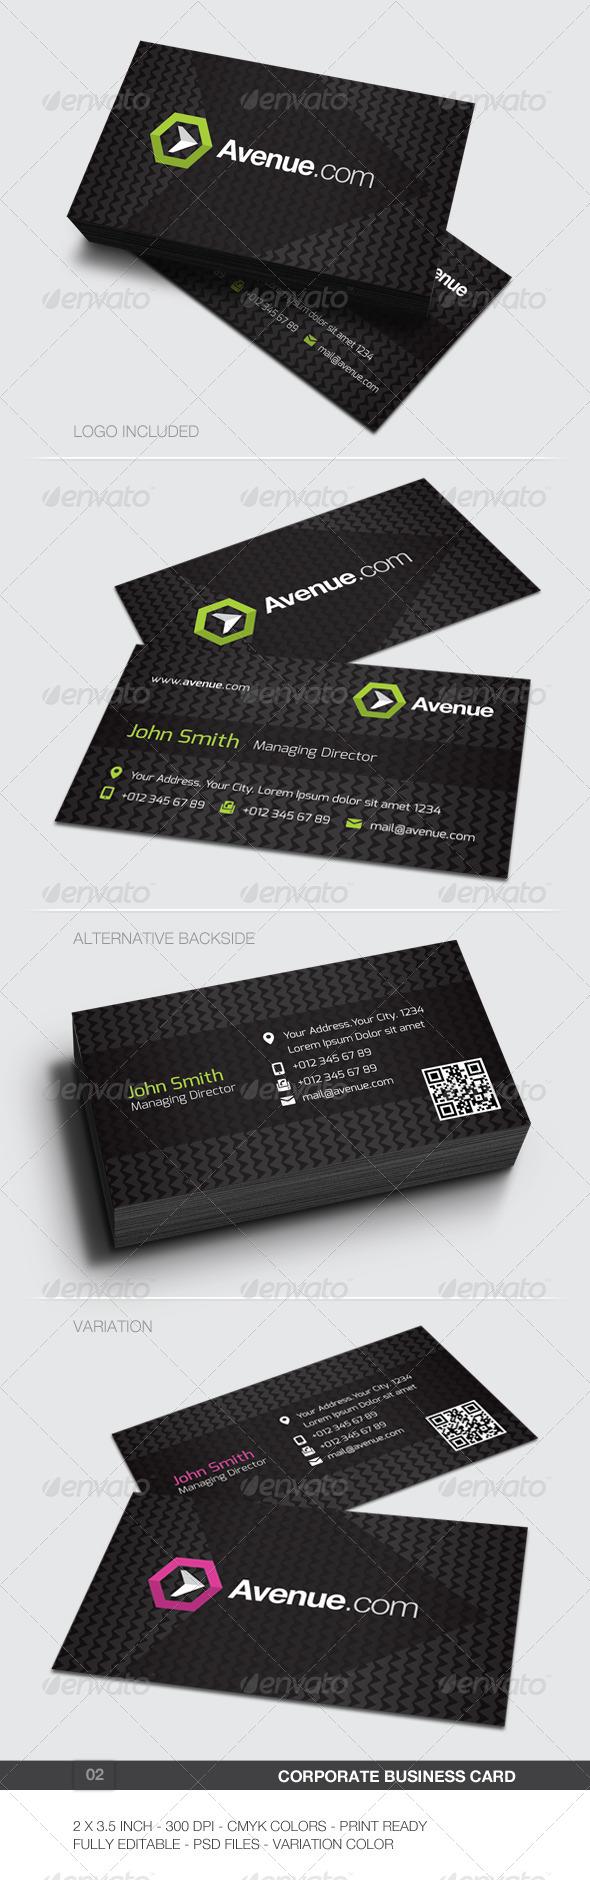 Corporate Business Card - 02 - Corporate Business Cards